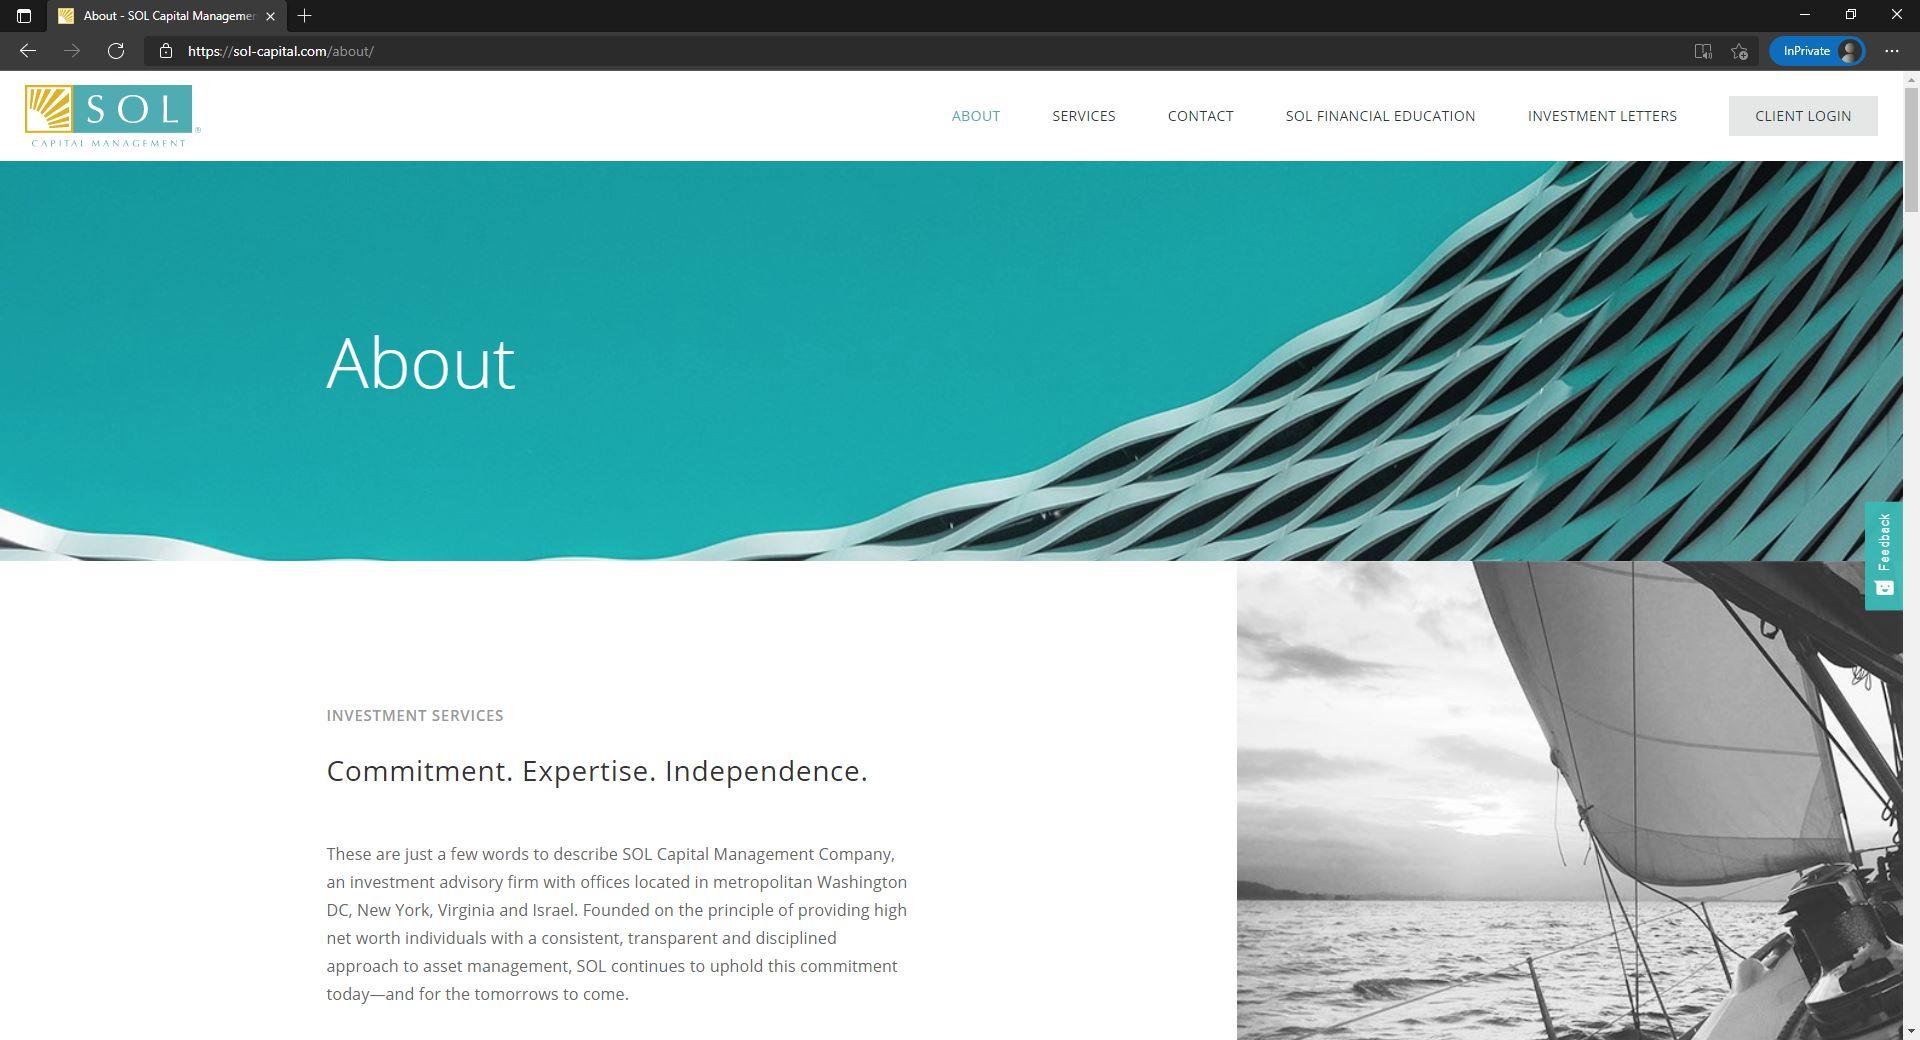 Sol Capital Management website